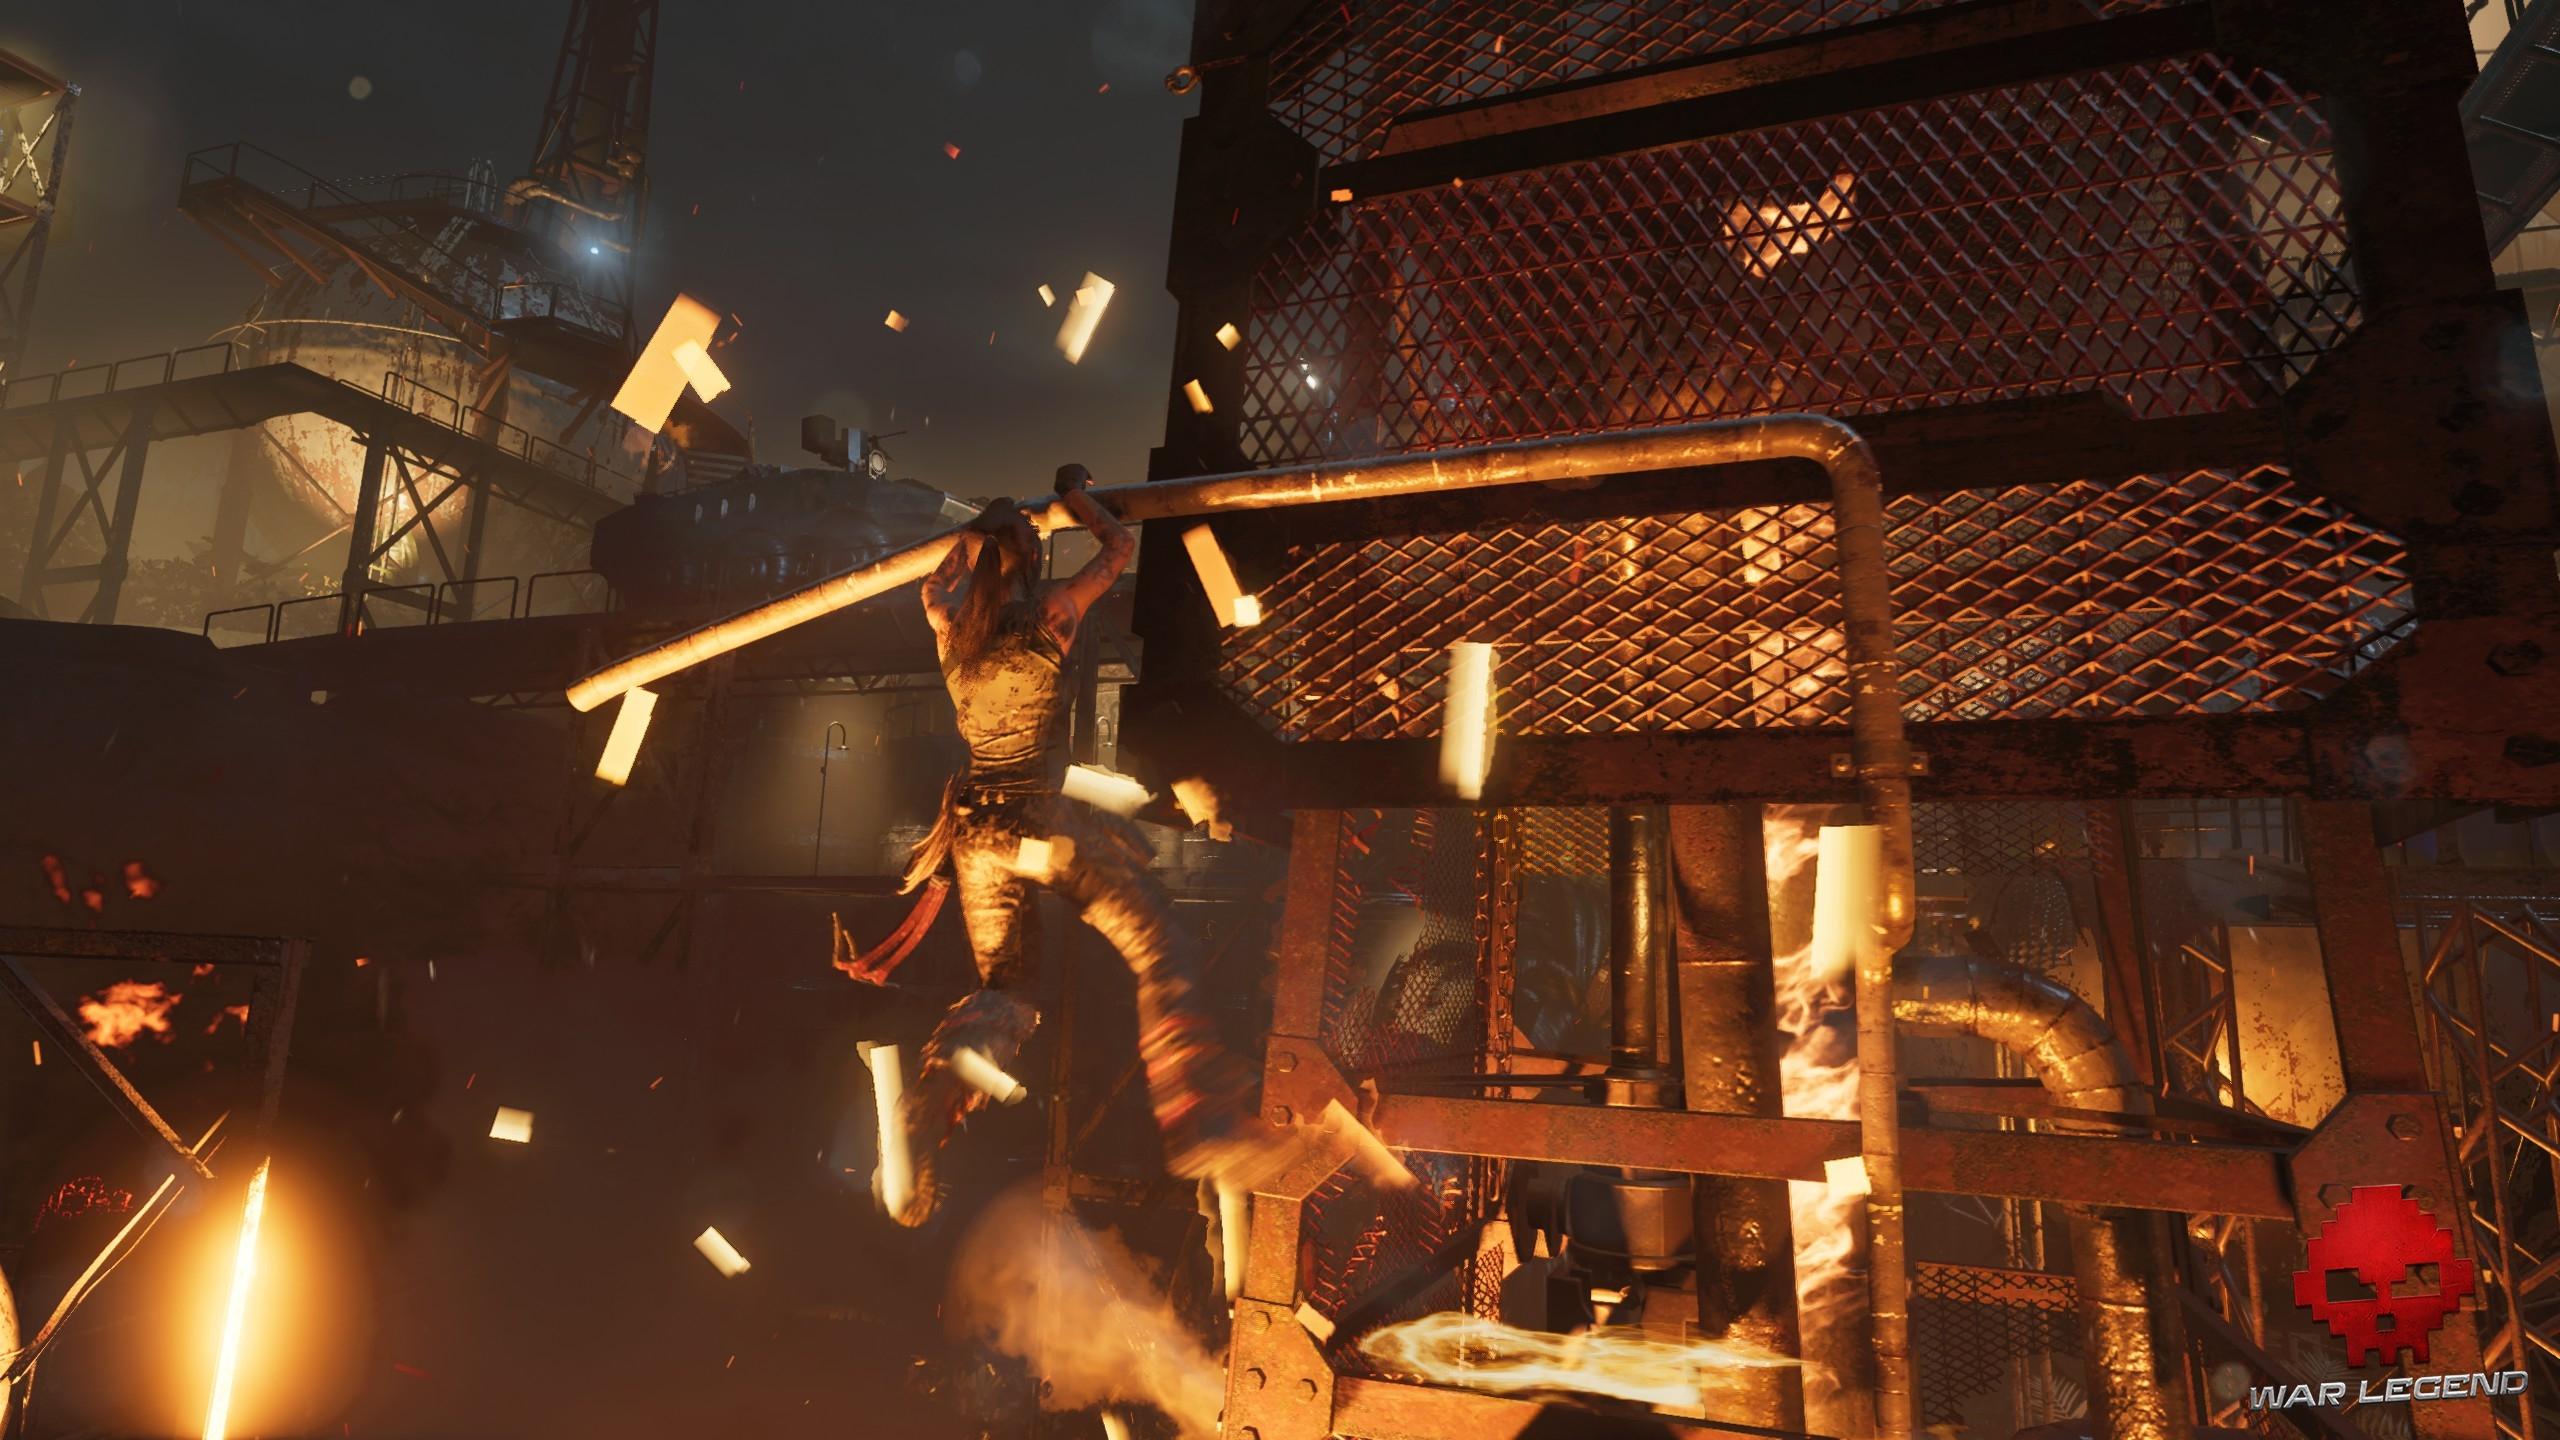 Lara Croft dans un passage explosif